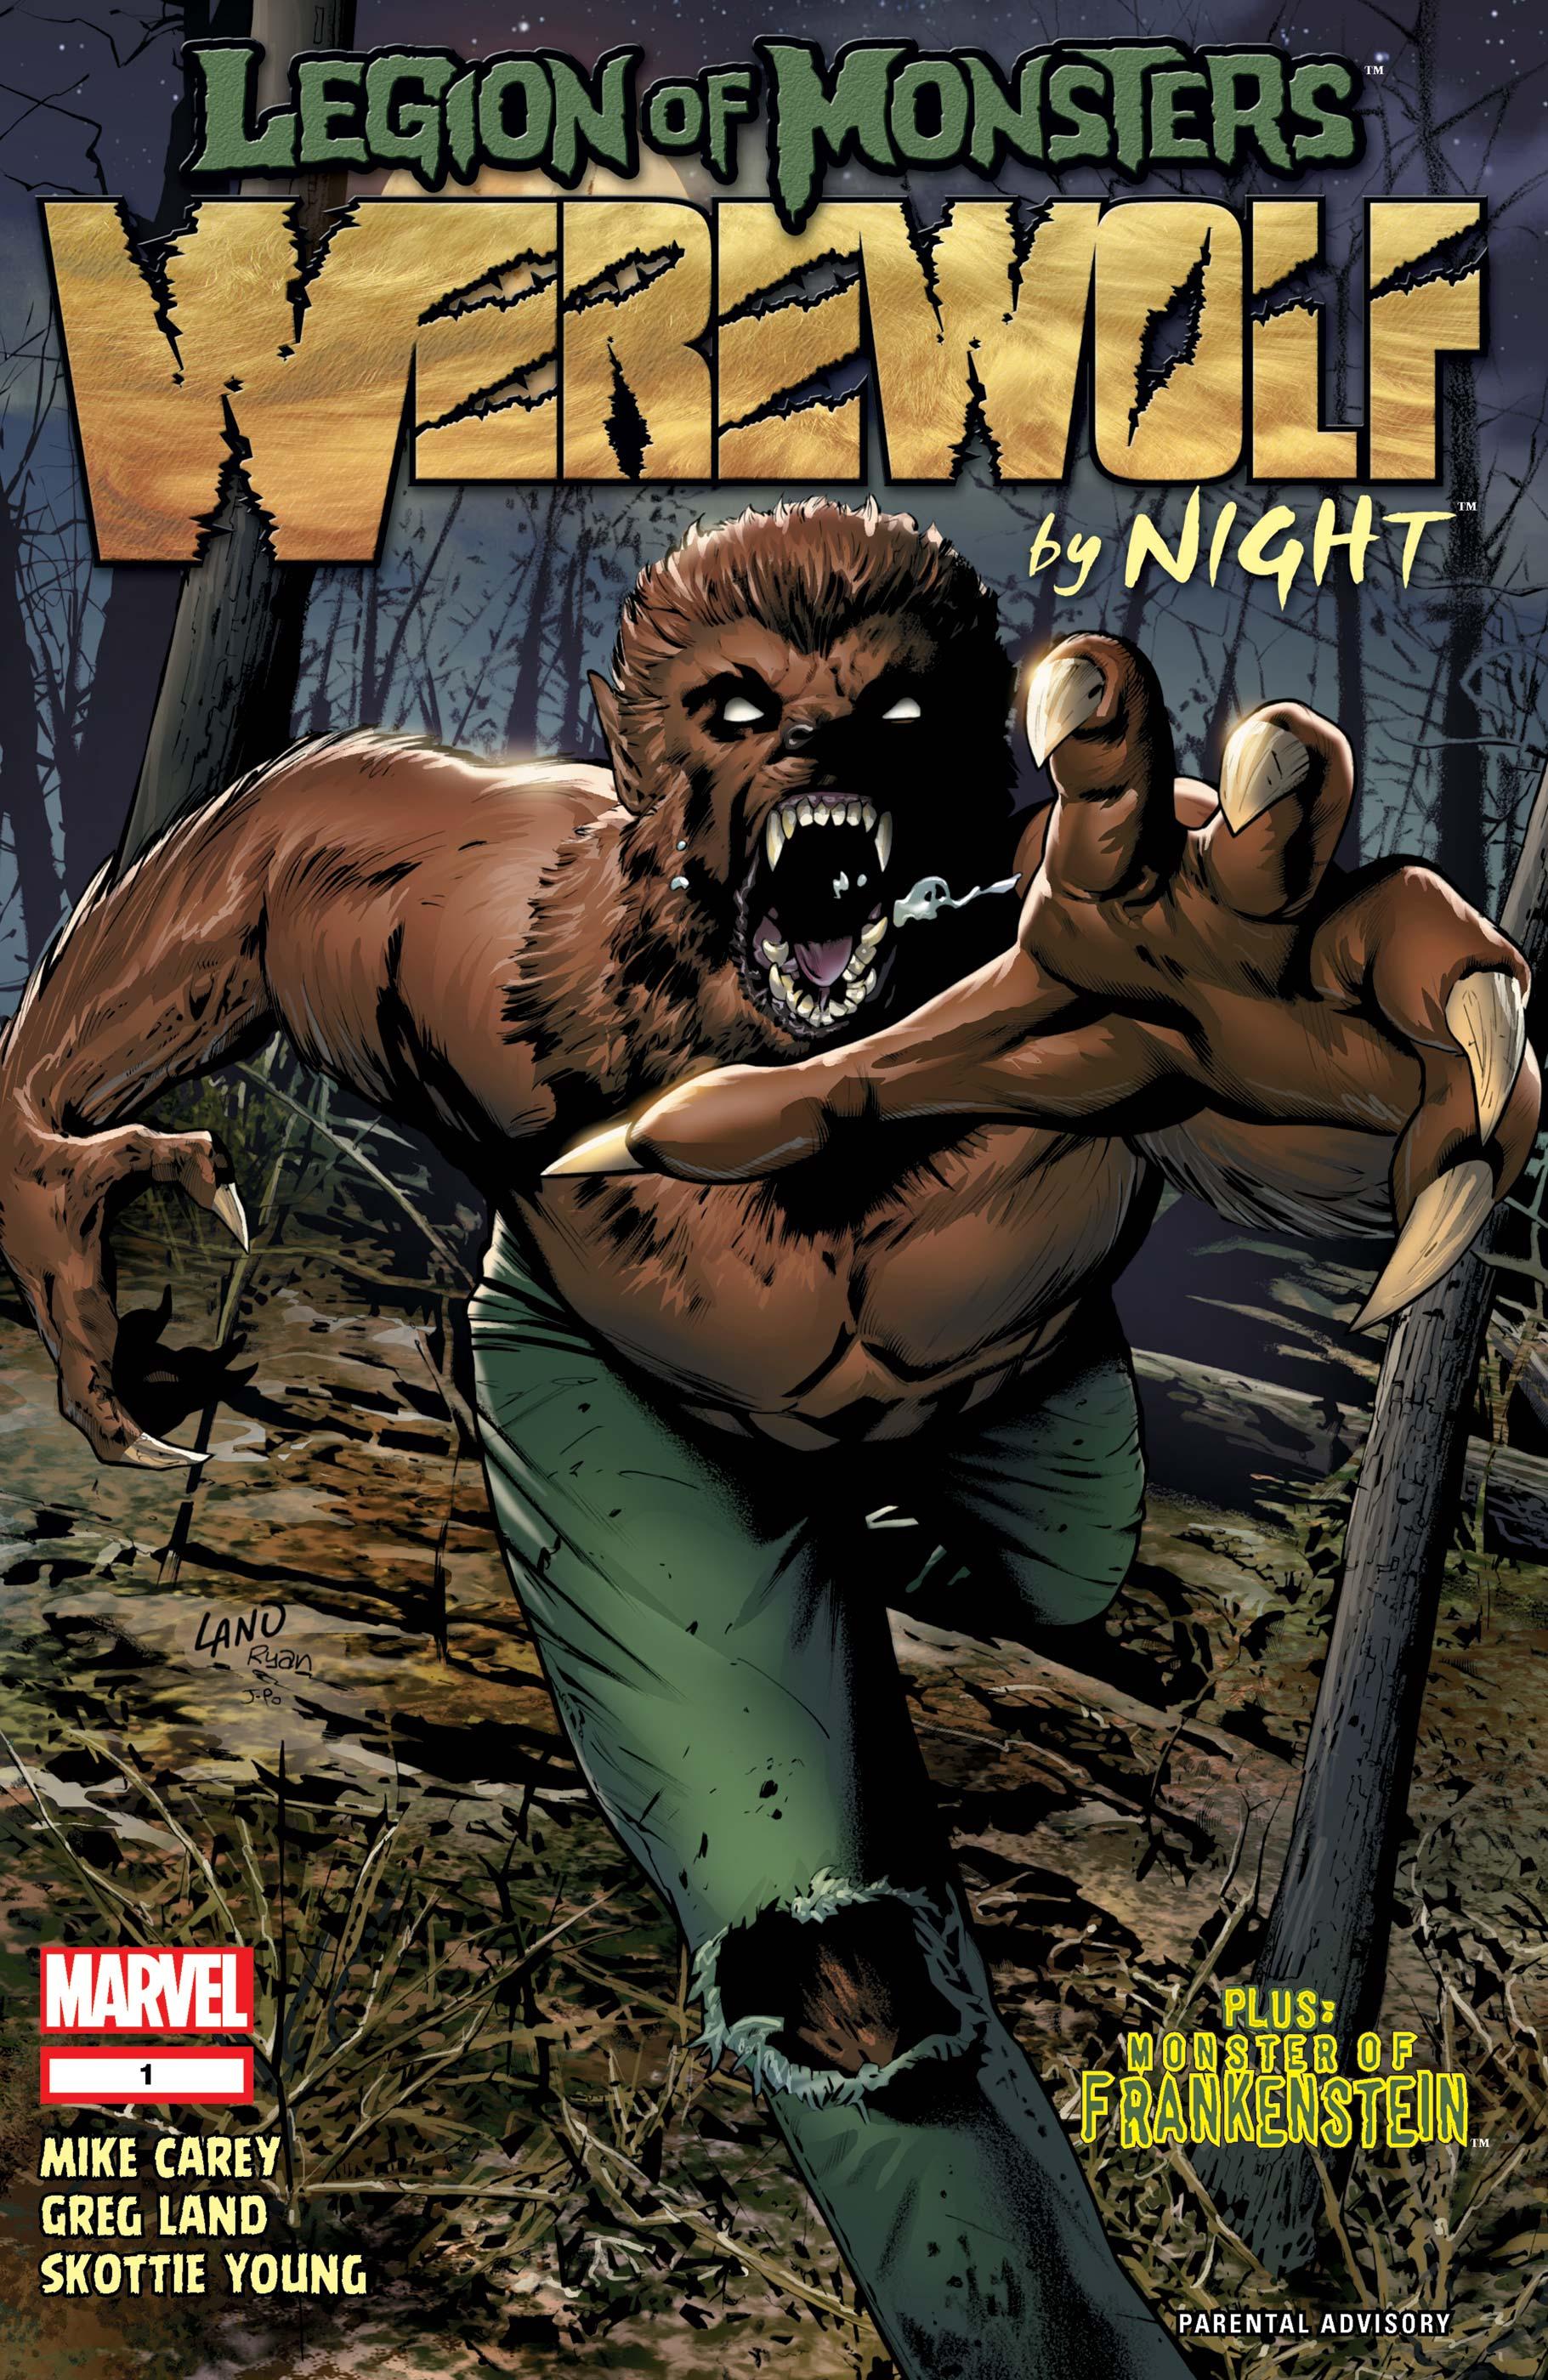 Legion of Monsters: Werewolf by Night (2007) #1